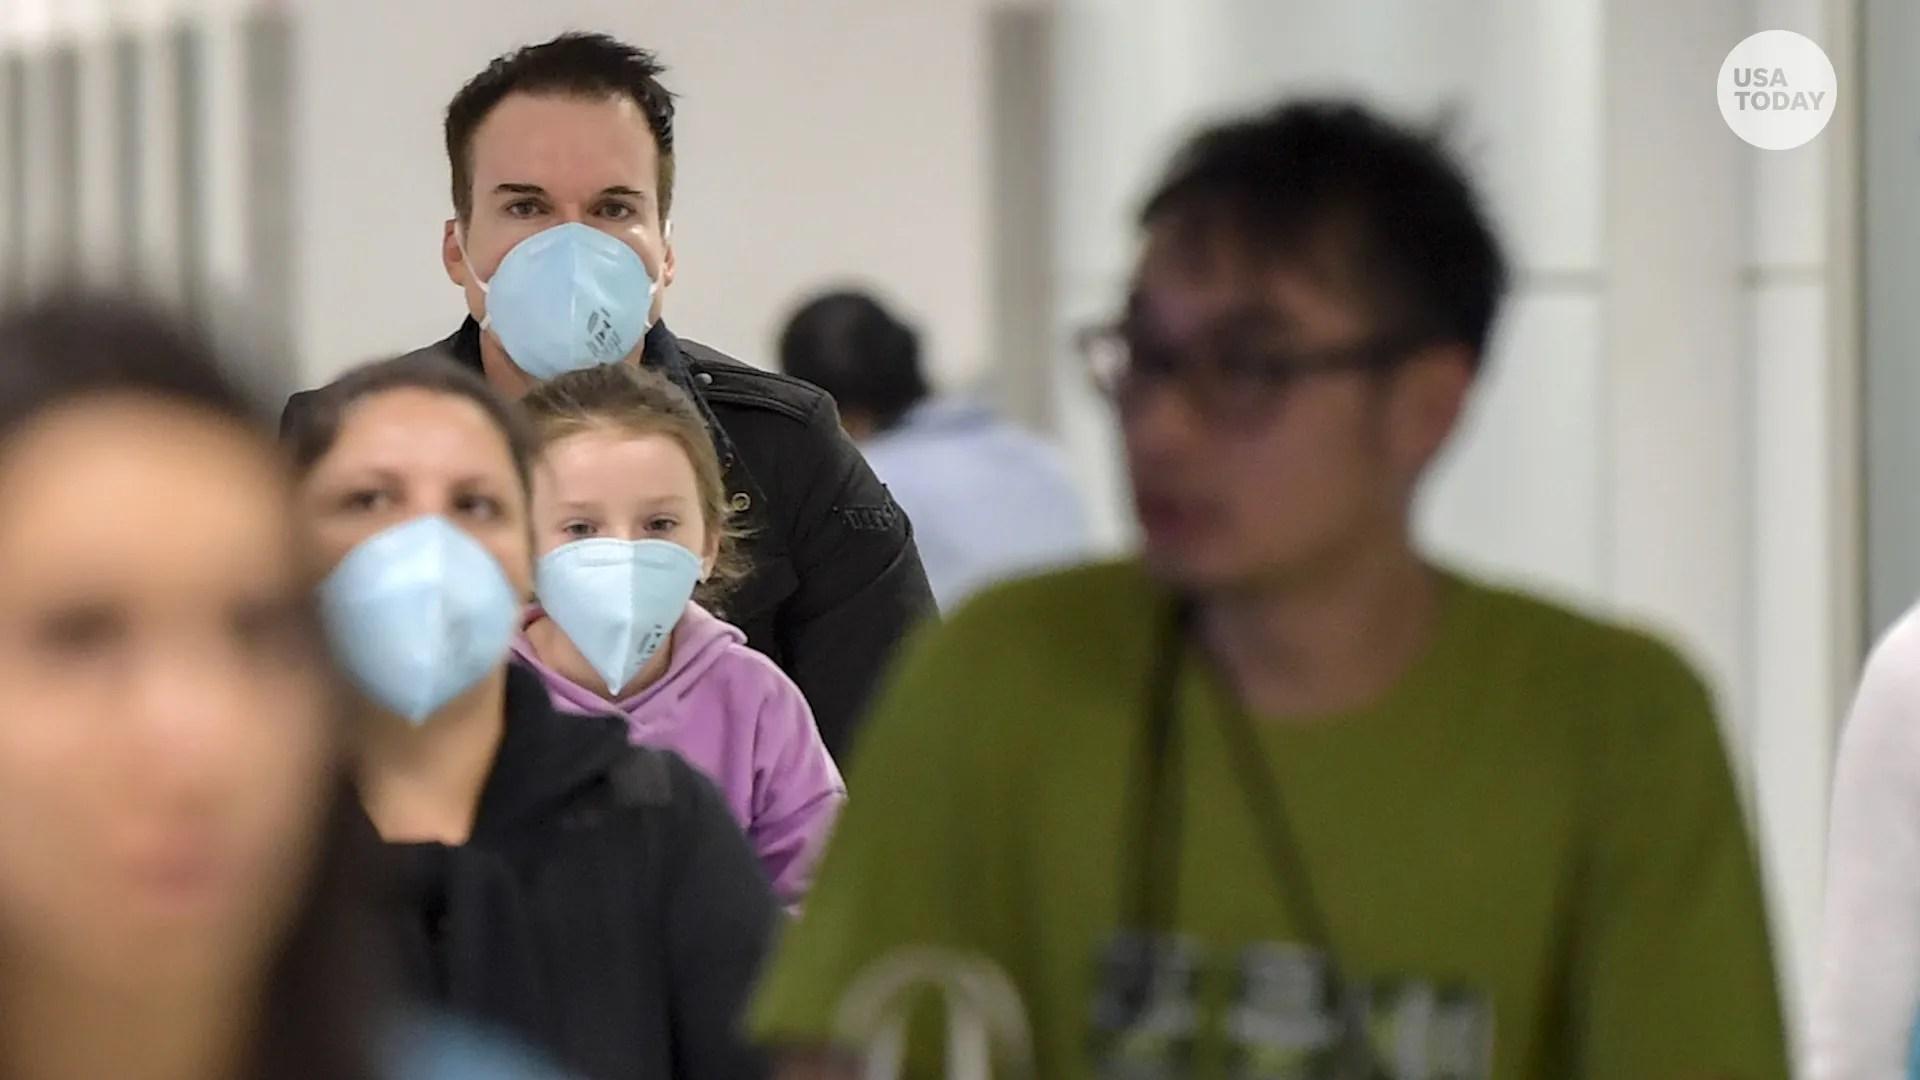 Coronavirus updates: HHS whistleblower, Pope, Diamond Princess death